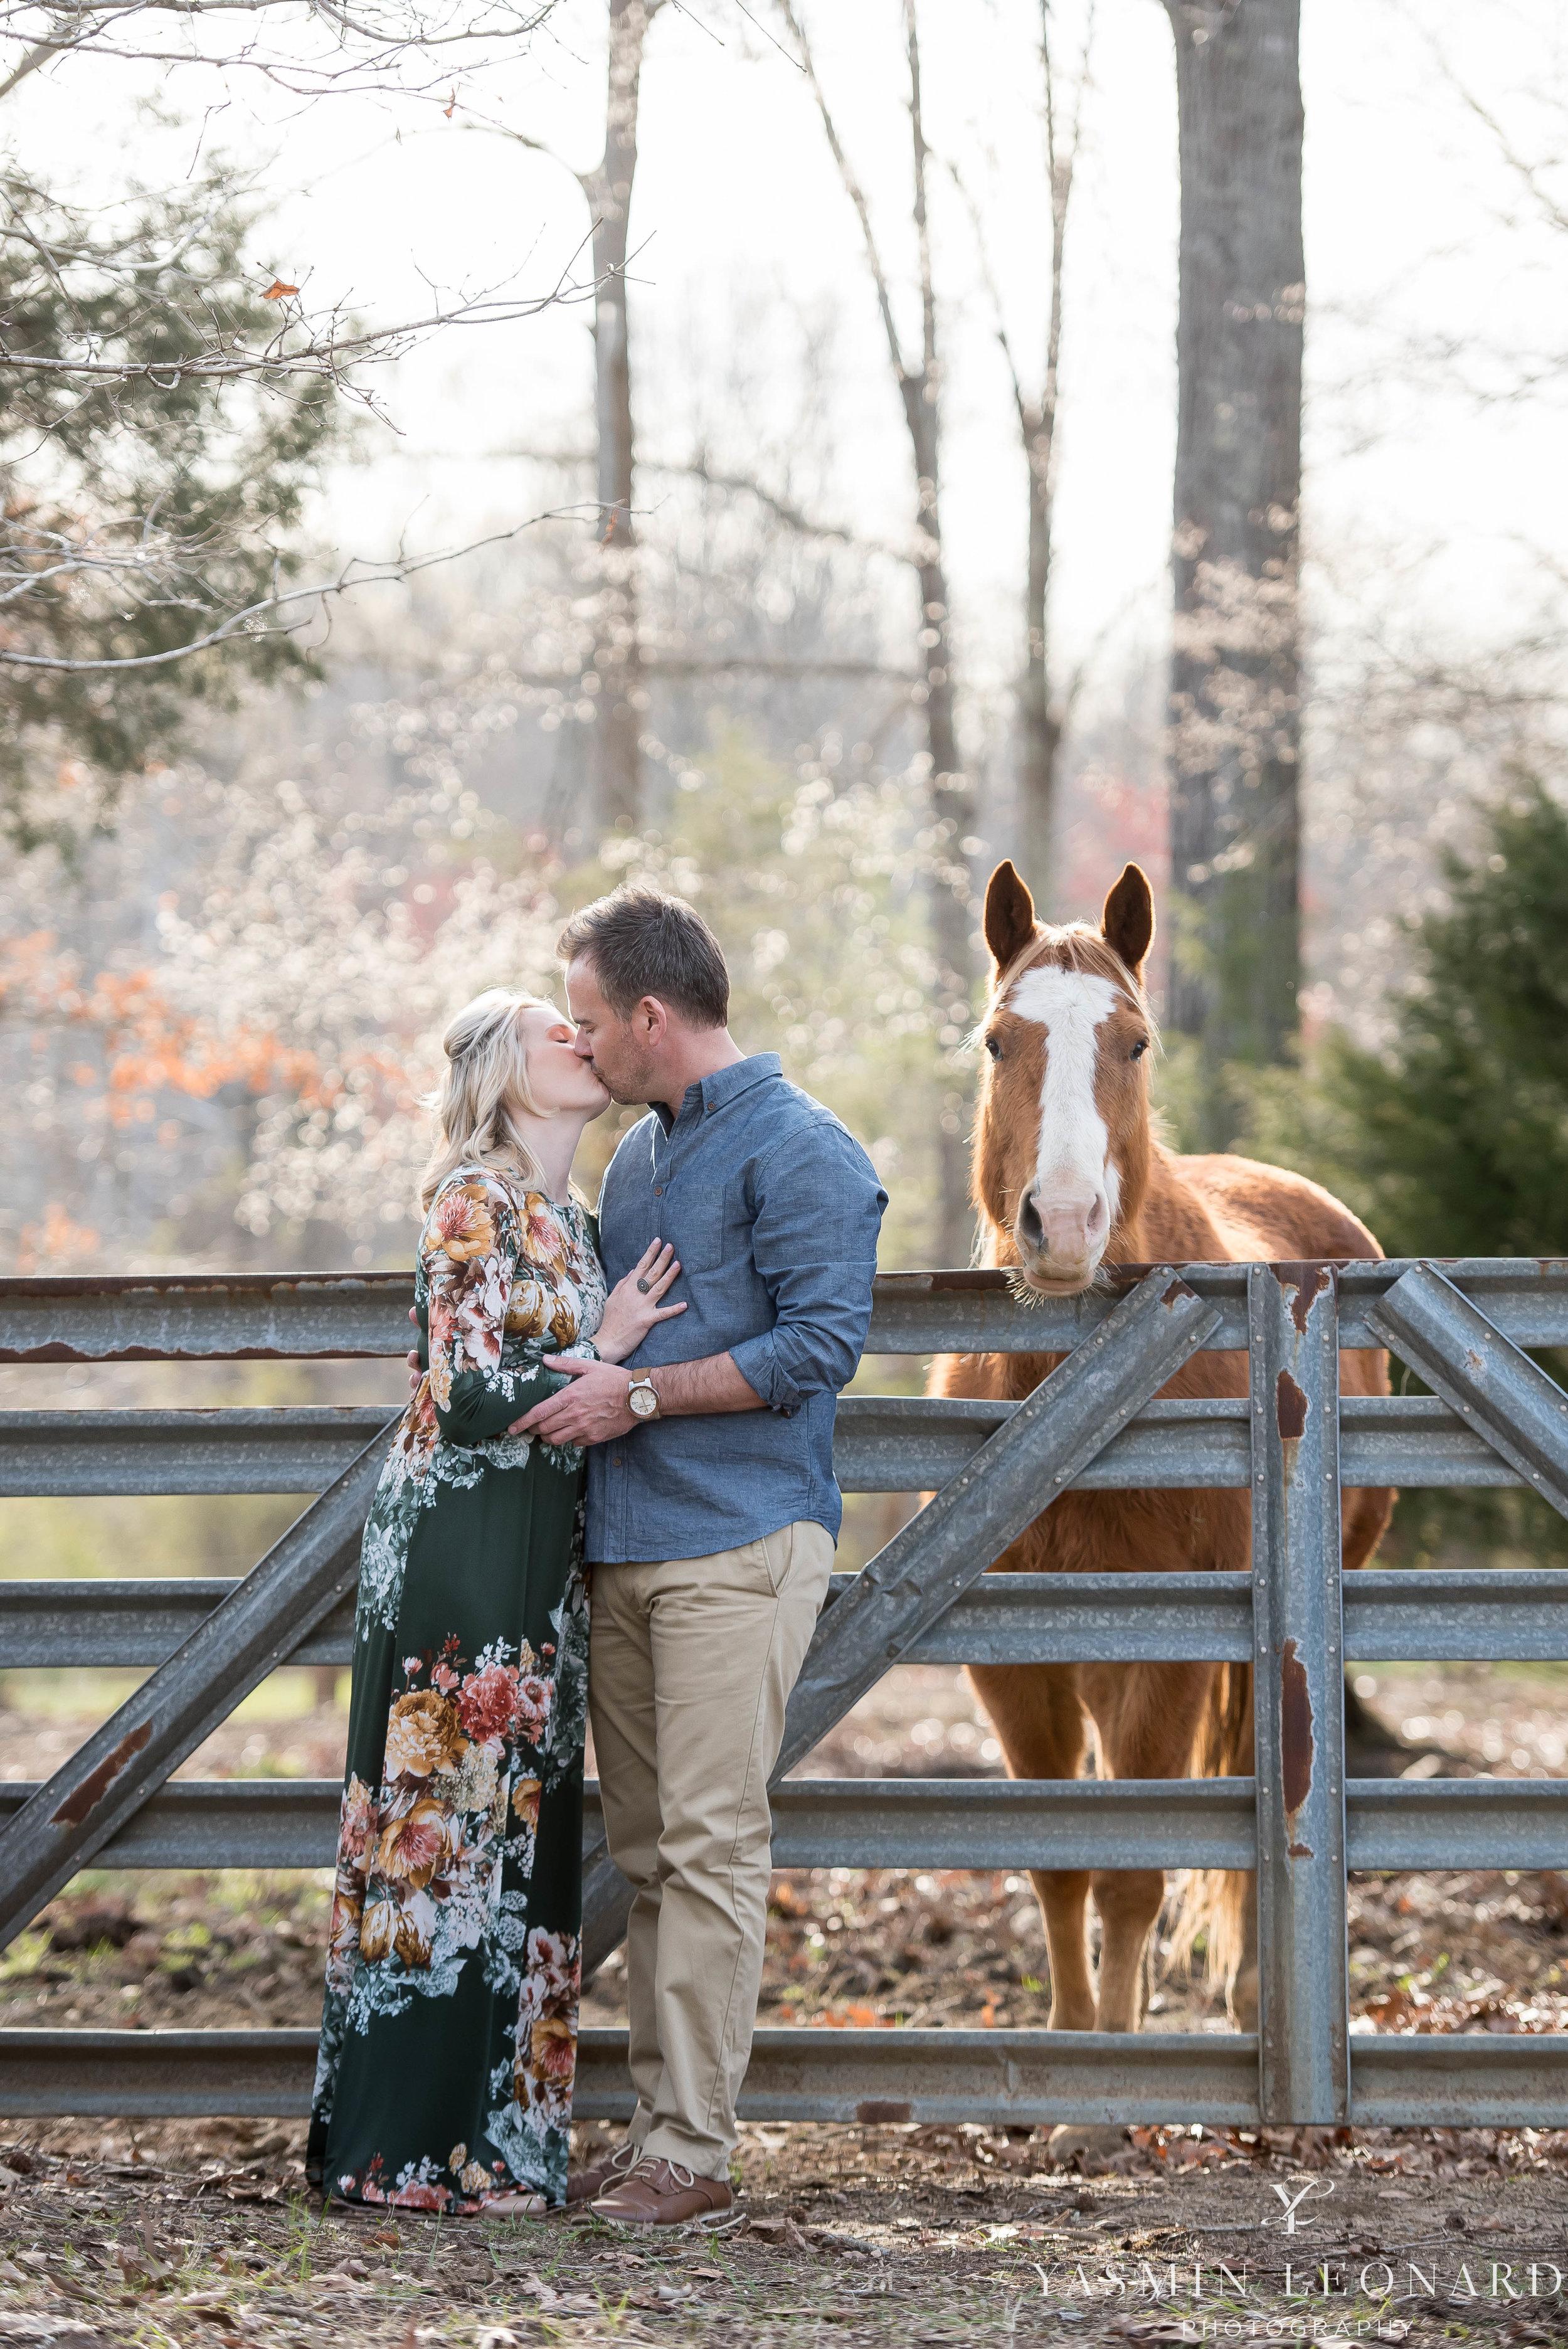 High Point Wedding Photographer - NC Wedding Photographer - Yasmin Leonard Photography - Engagement Poses - Engagement Ideas - Outdoor Engagement Session-20.jpg